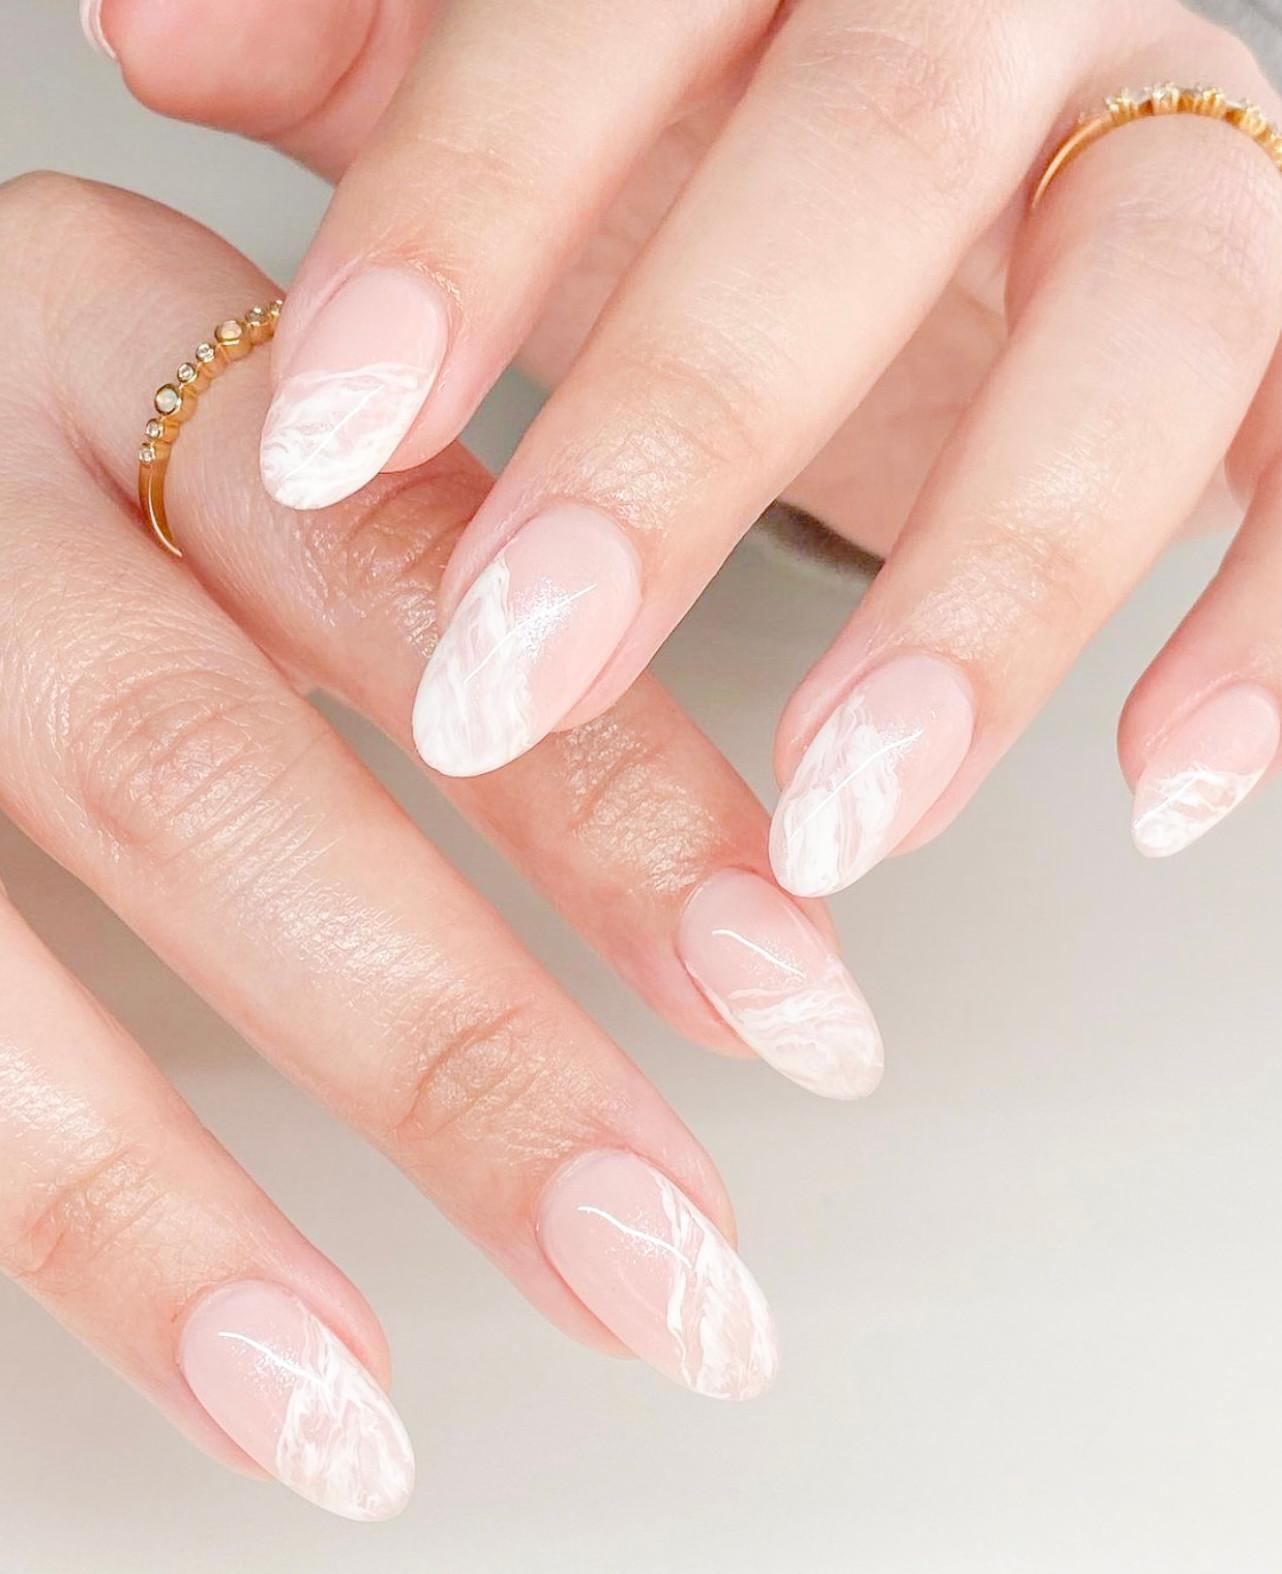 Bridal Manicure & Pedicure